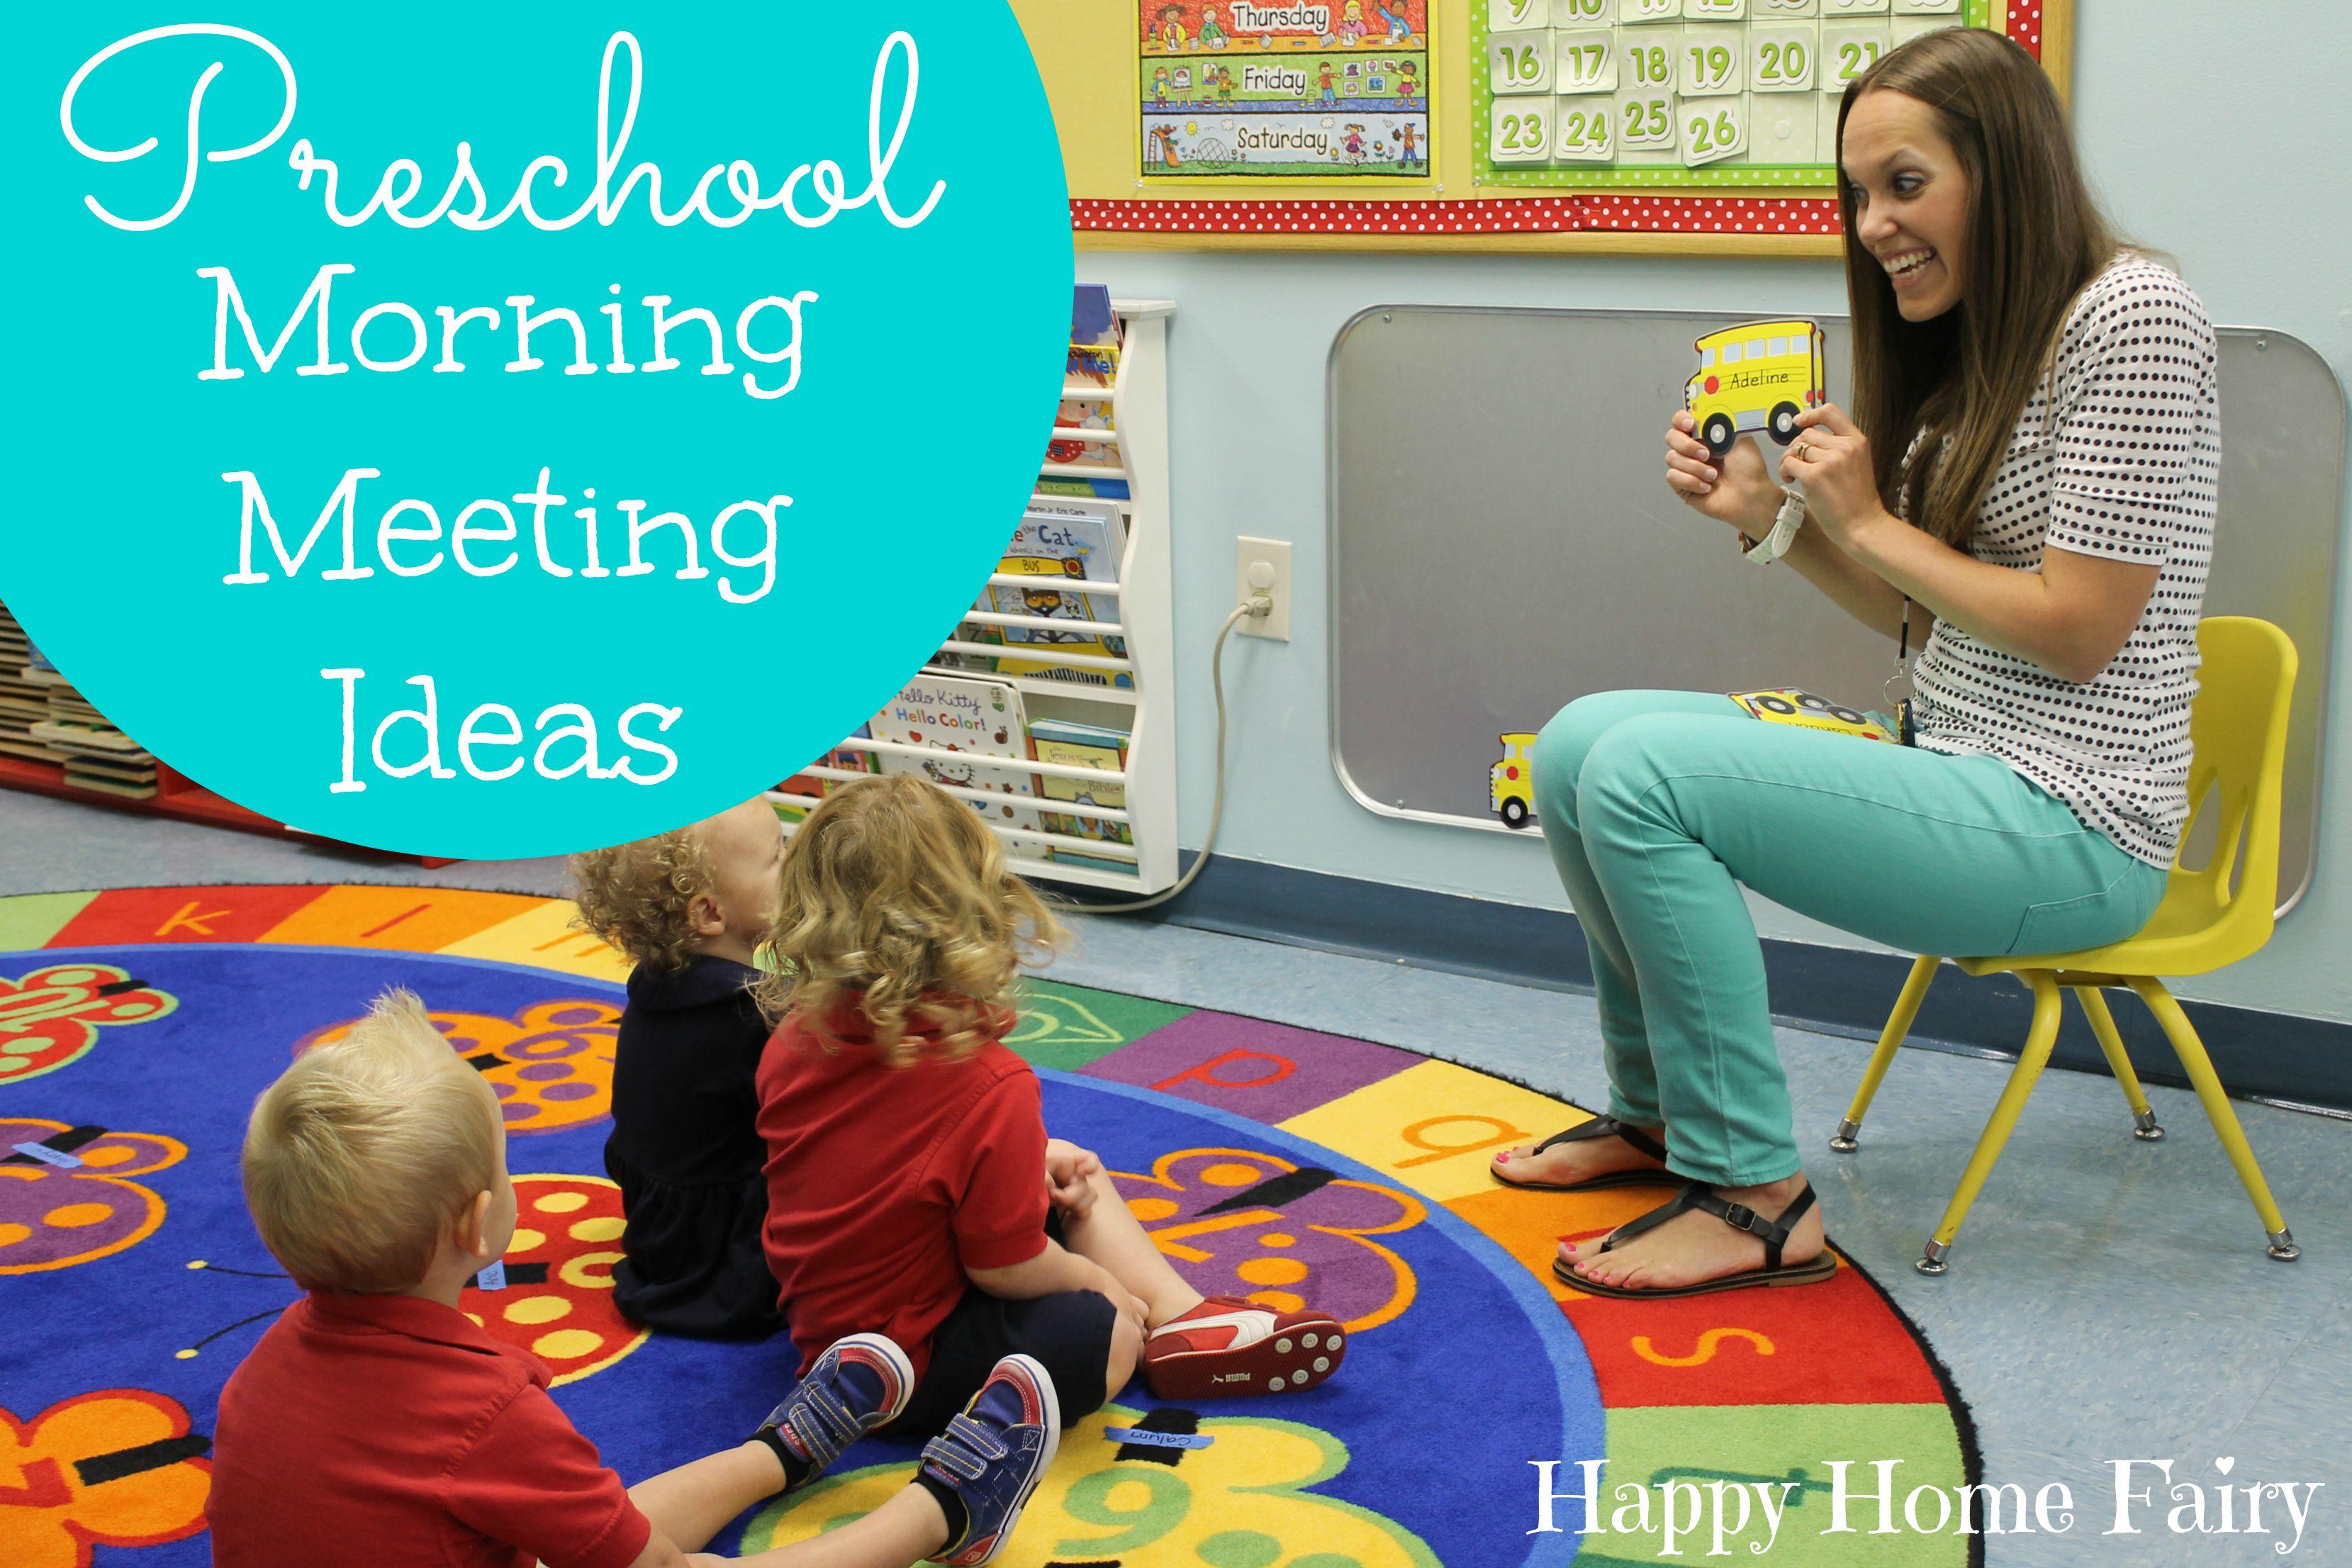 morning meeting ideas for preschool preschool morning meeting ideas happy home 418